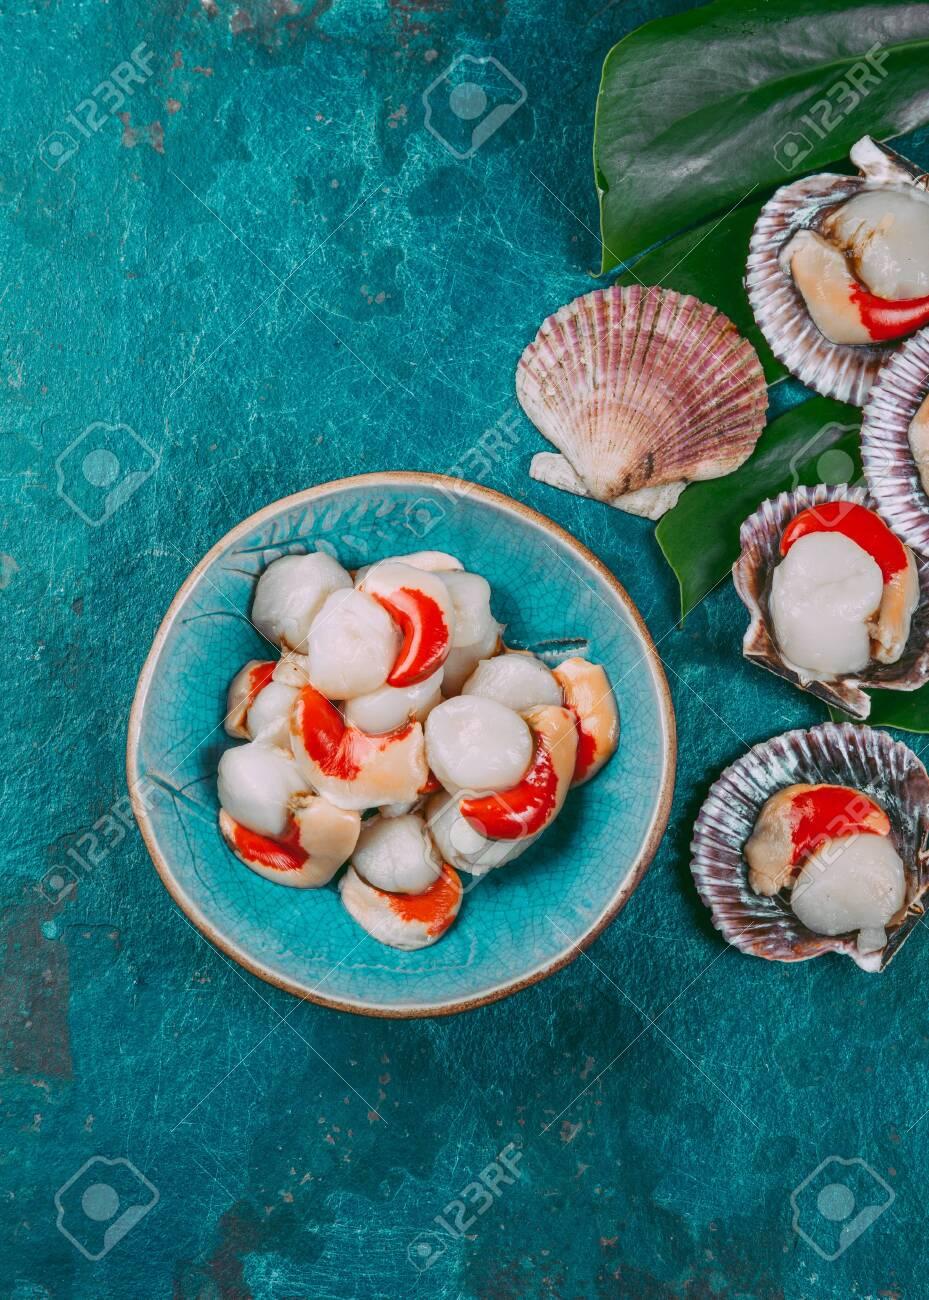 Raw fresh seafood shellfish scallops on blue background. - 130165459